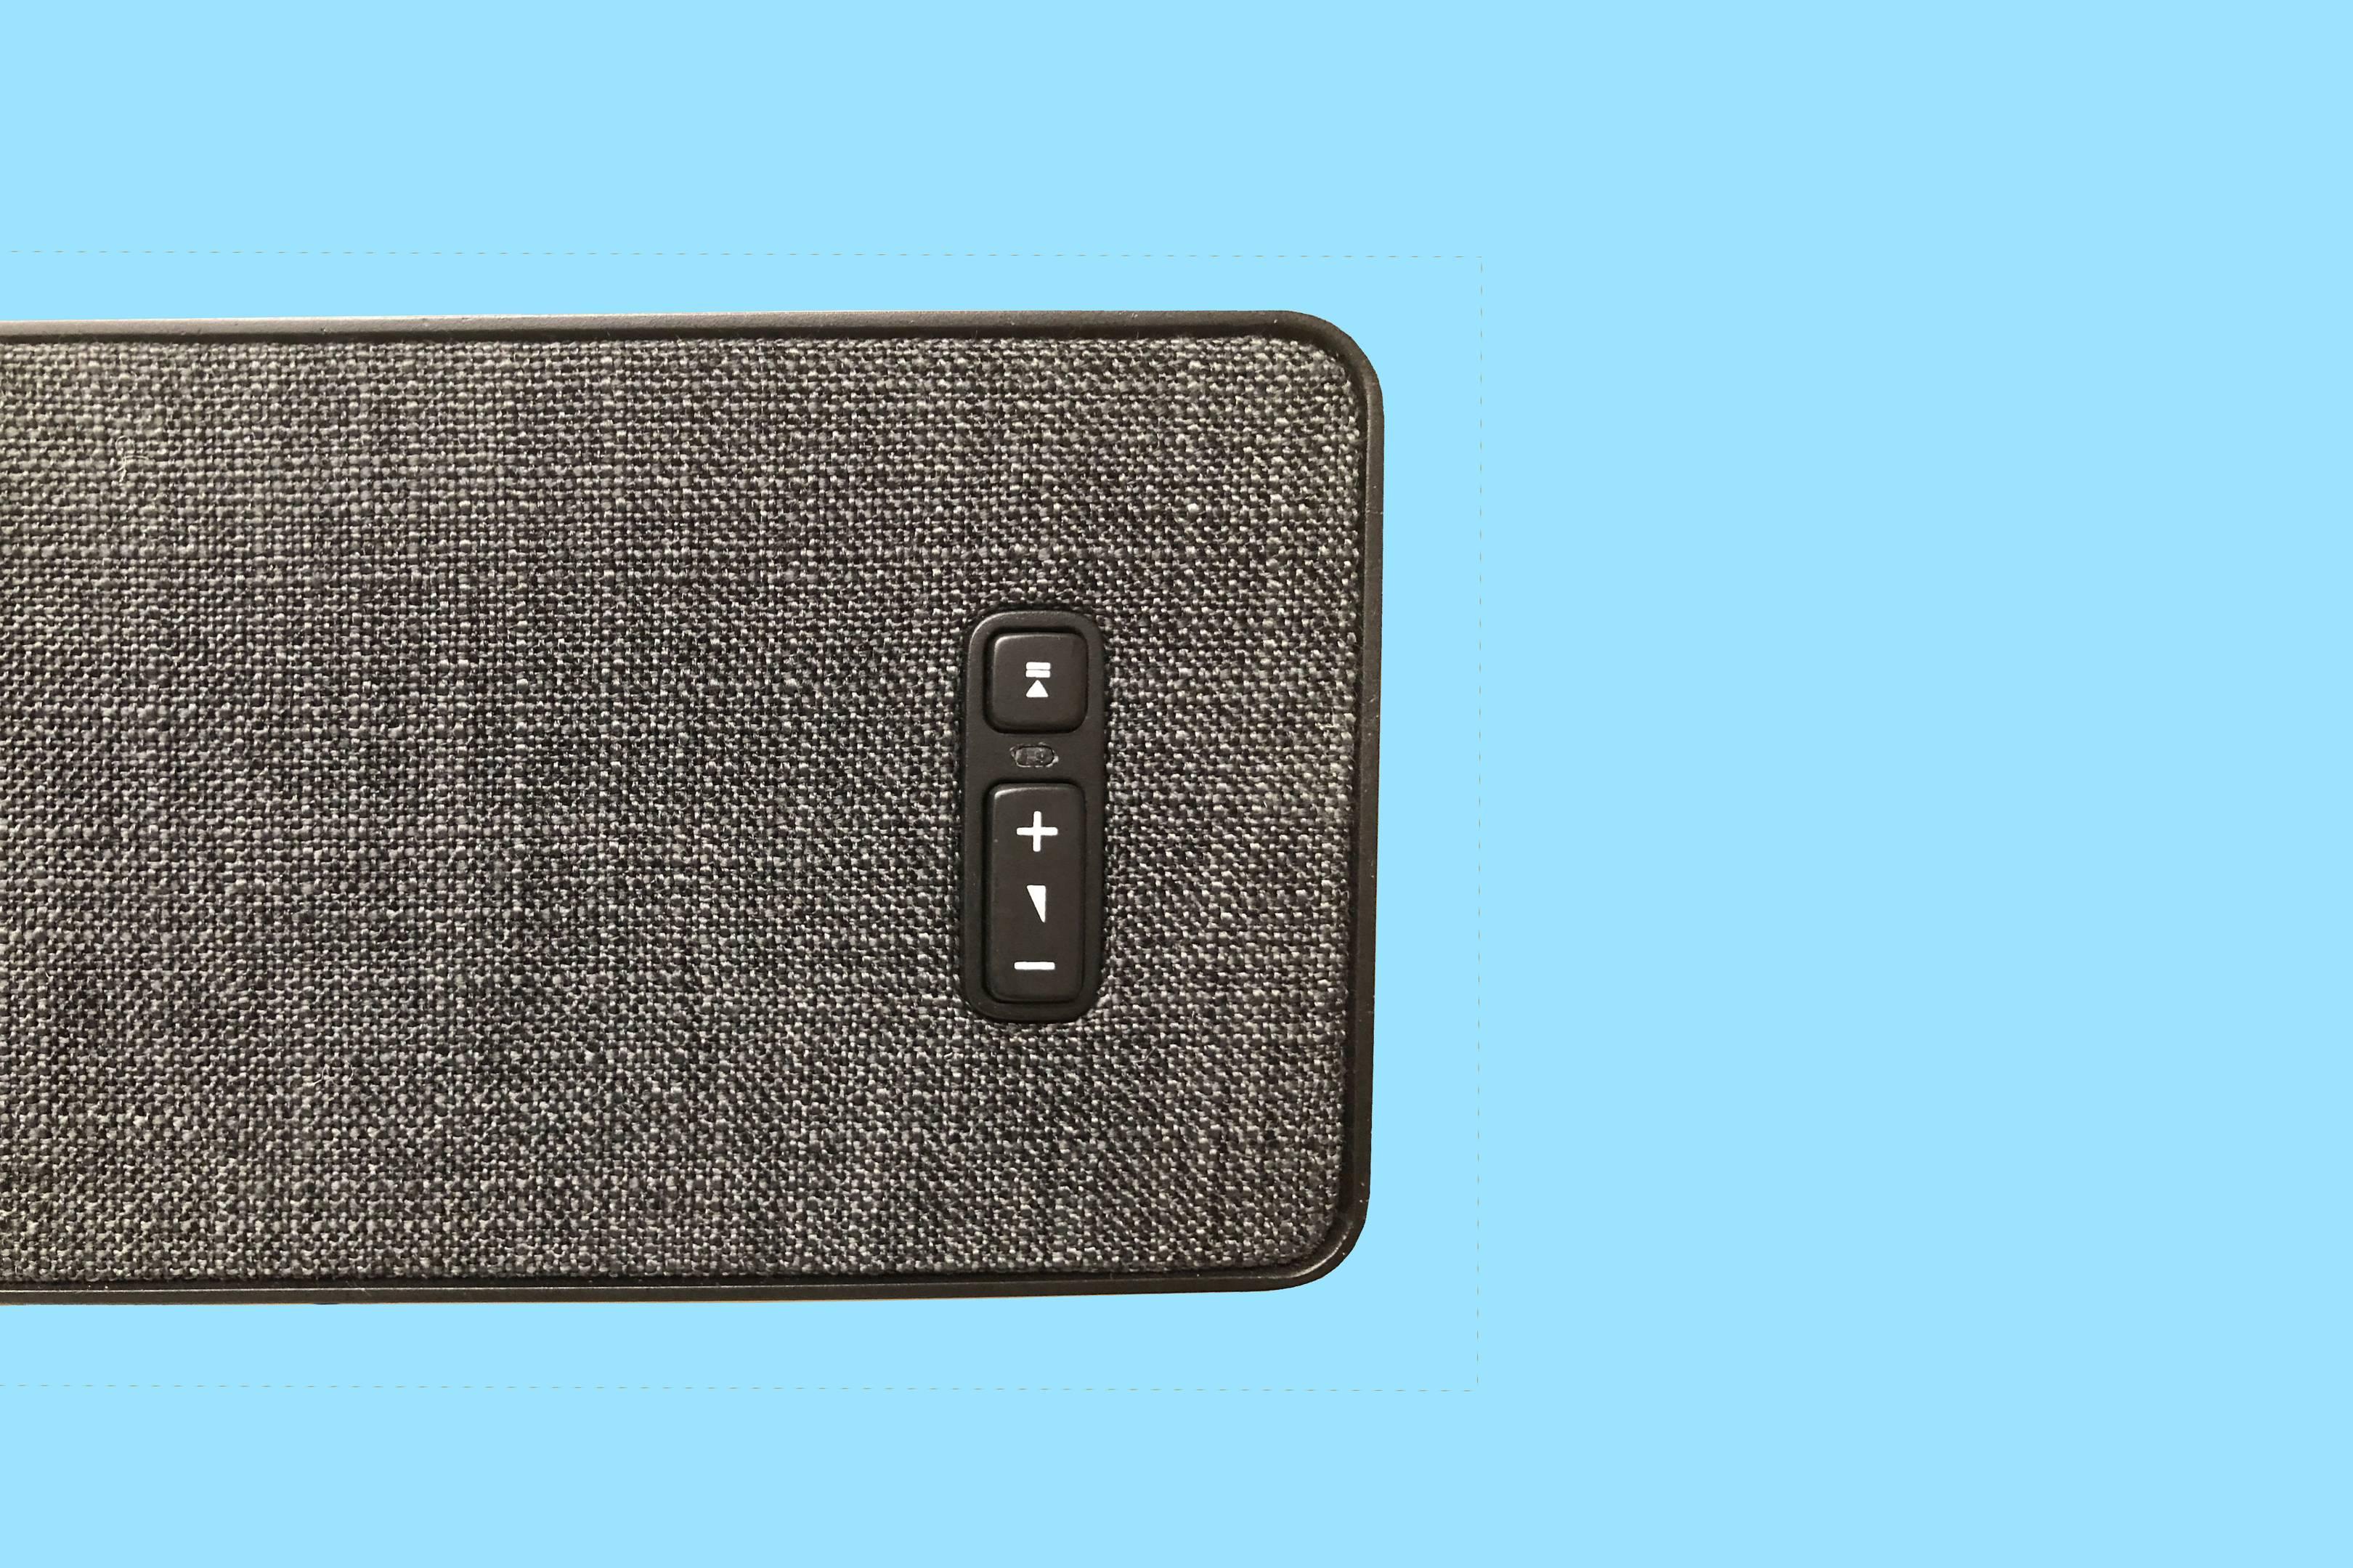 Sonos and IKEAu0027s Symfonisk smart speaker